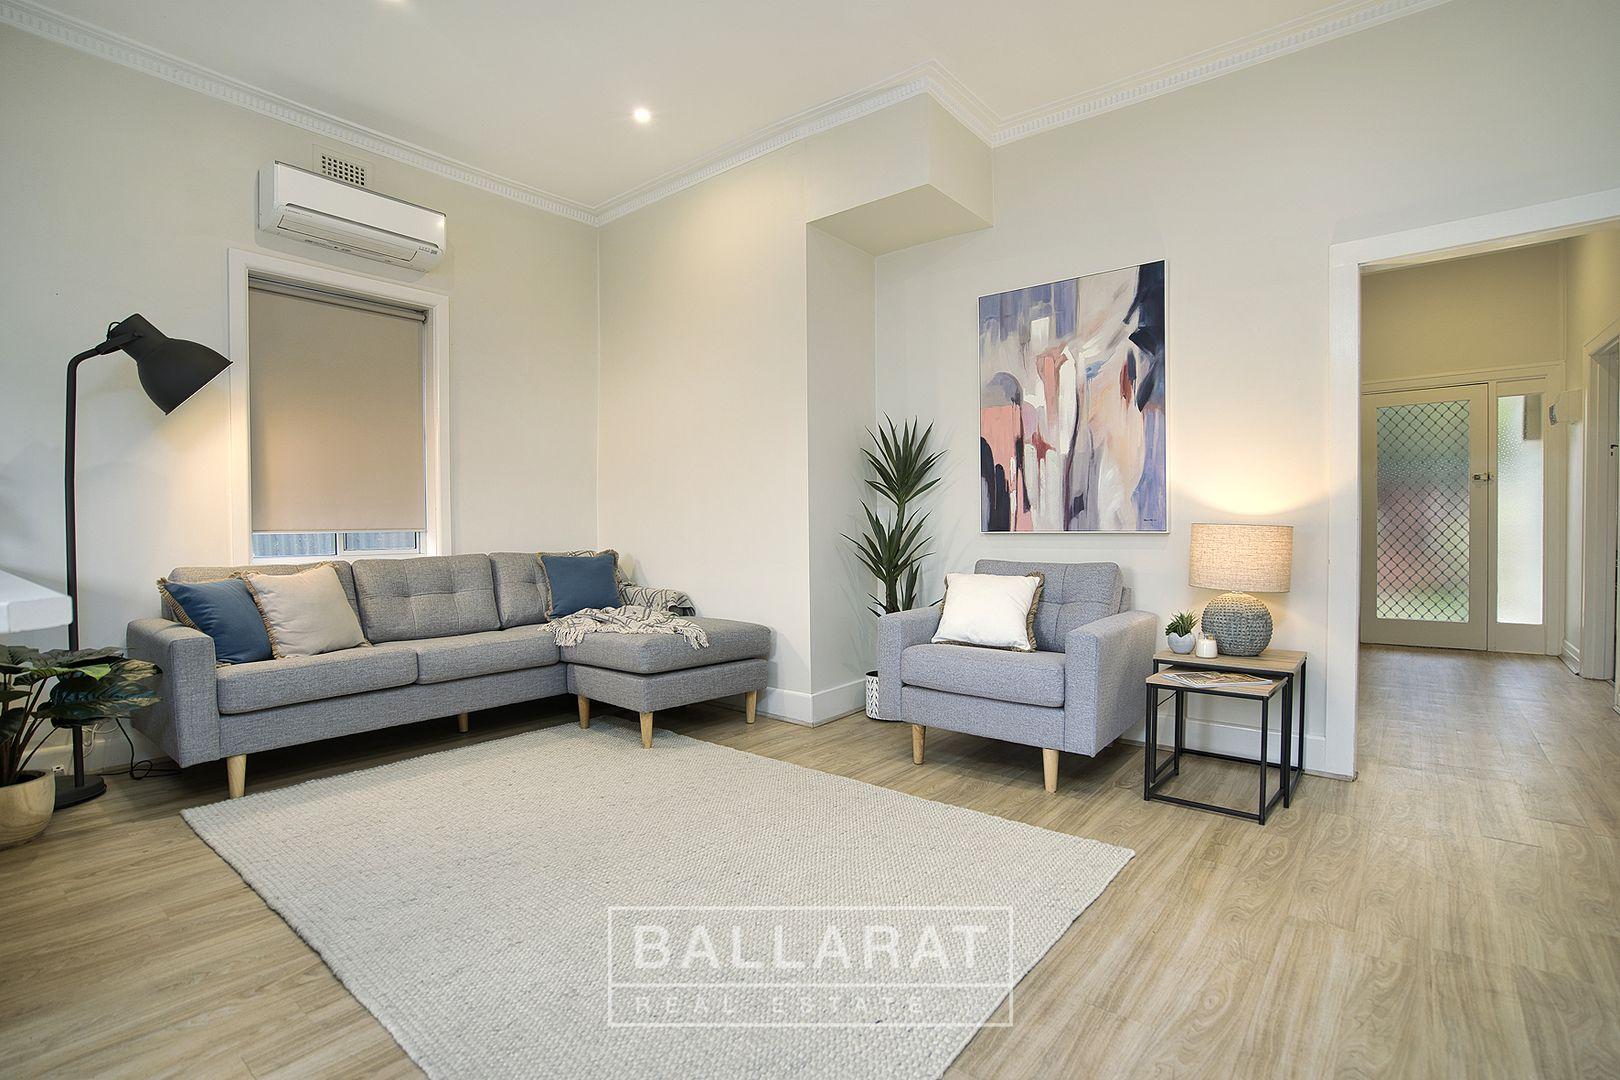 207 Nelson Street, Ballarat East VIC 3350, Image 1